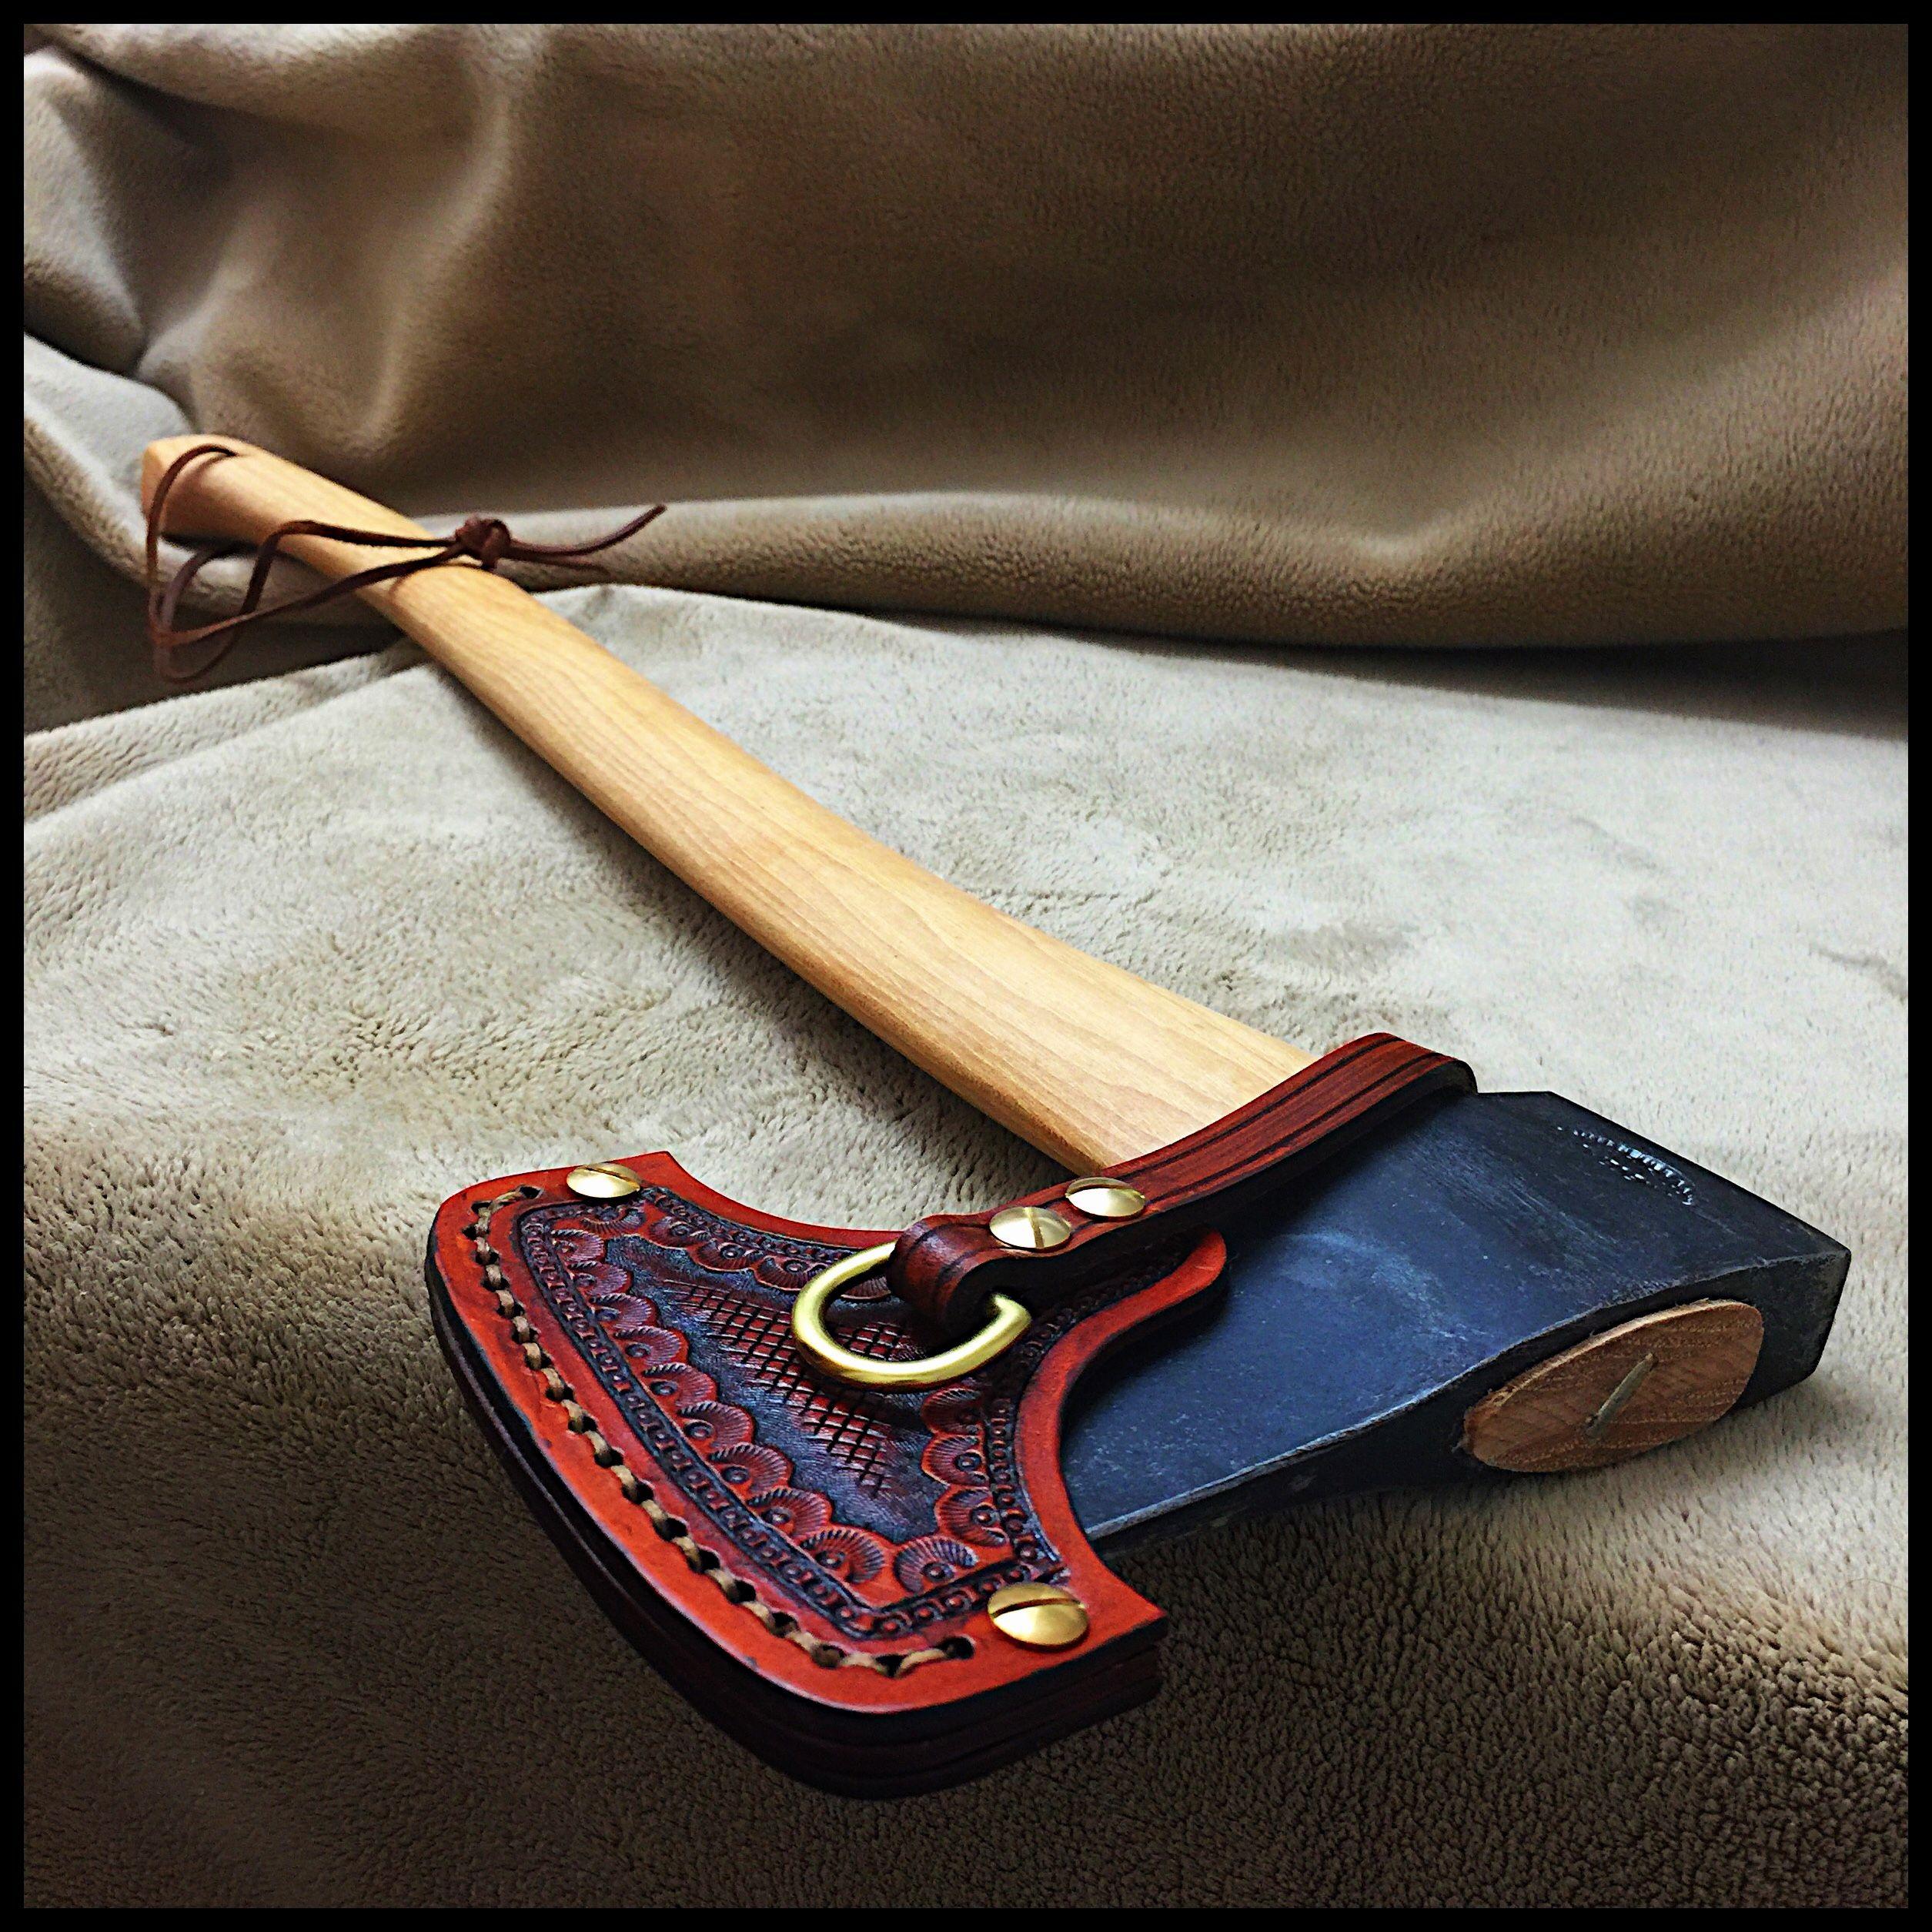 Gransfors Bruks Scandinavian Forest Axe 430 With Custom Leather Sheath By John Black Machado Medievais Machado